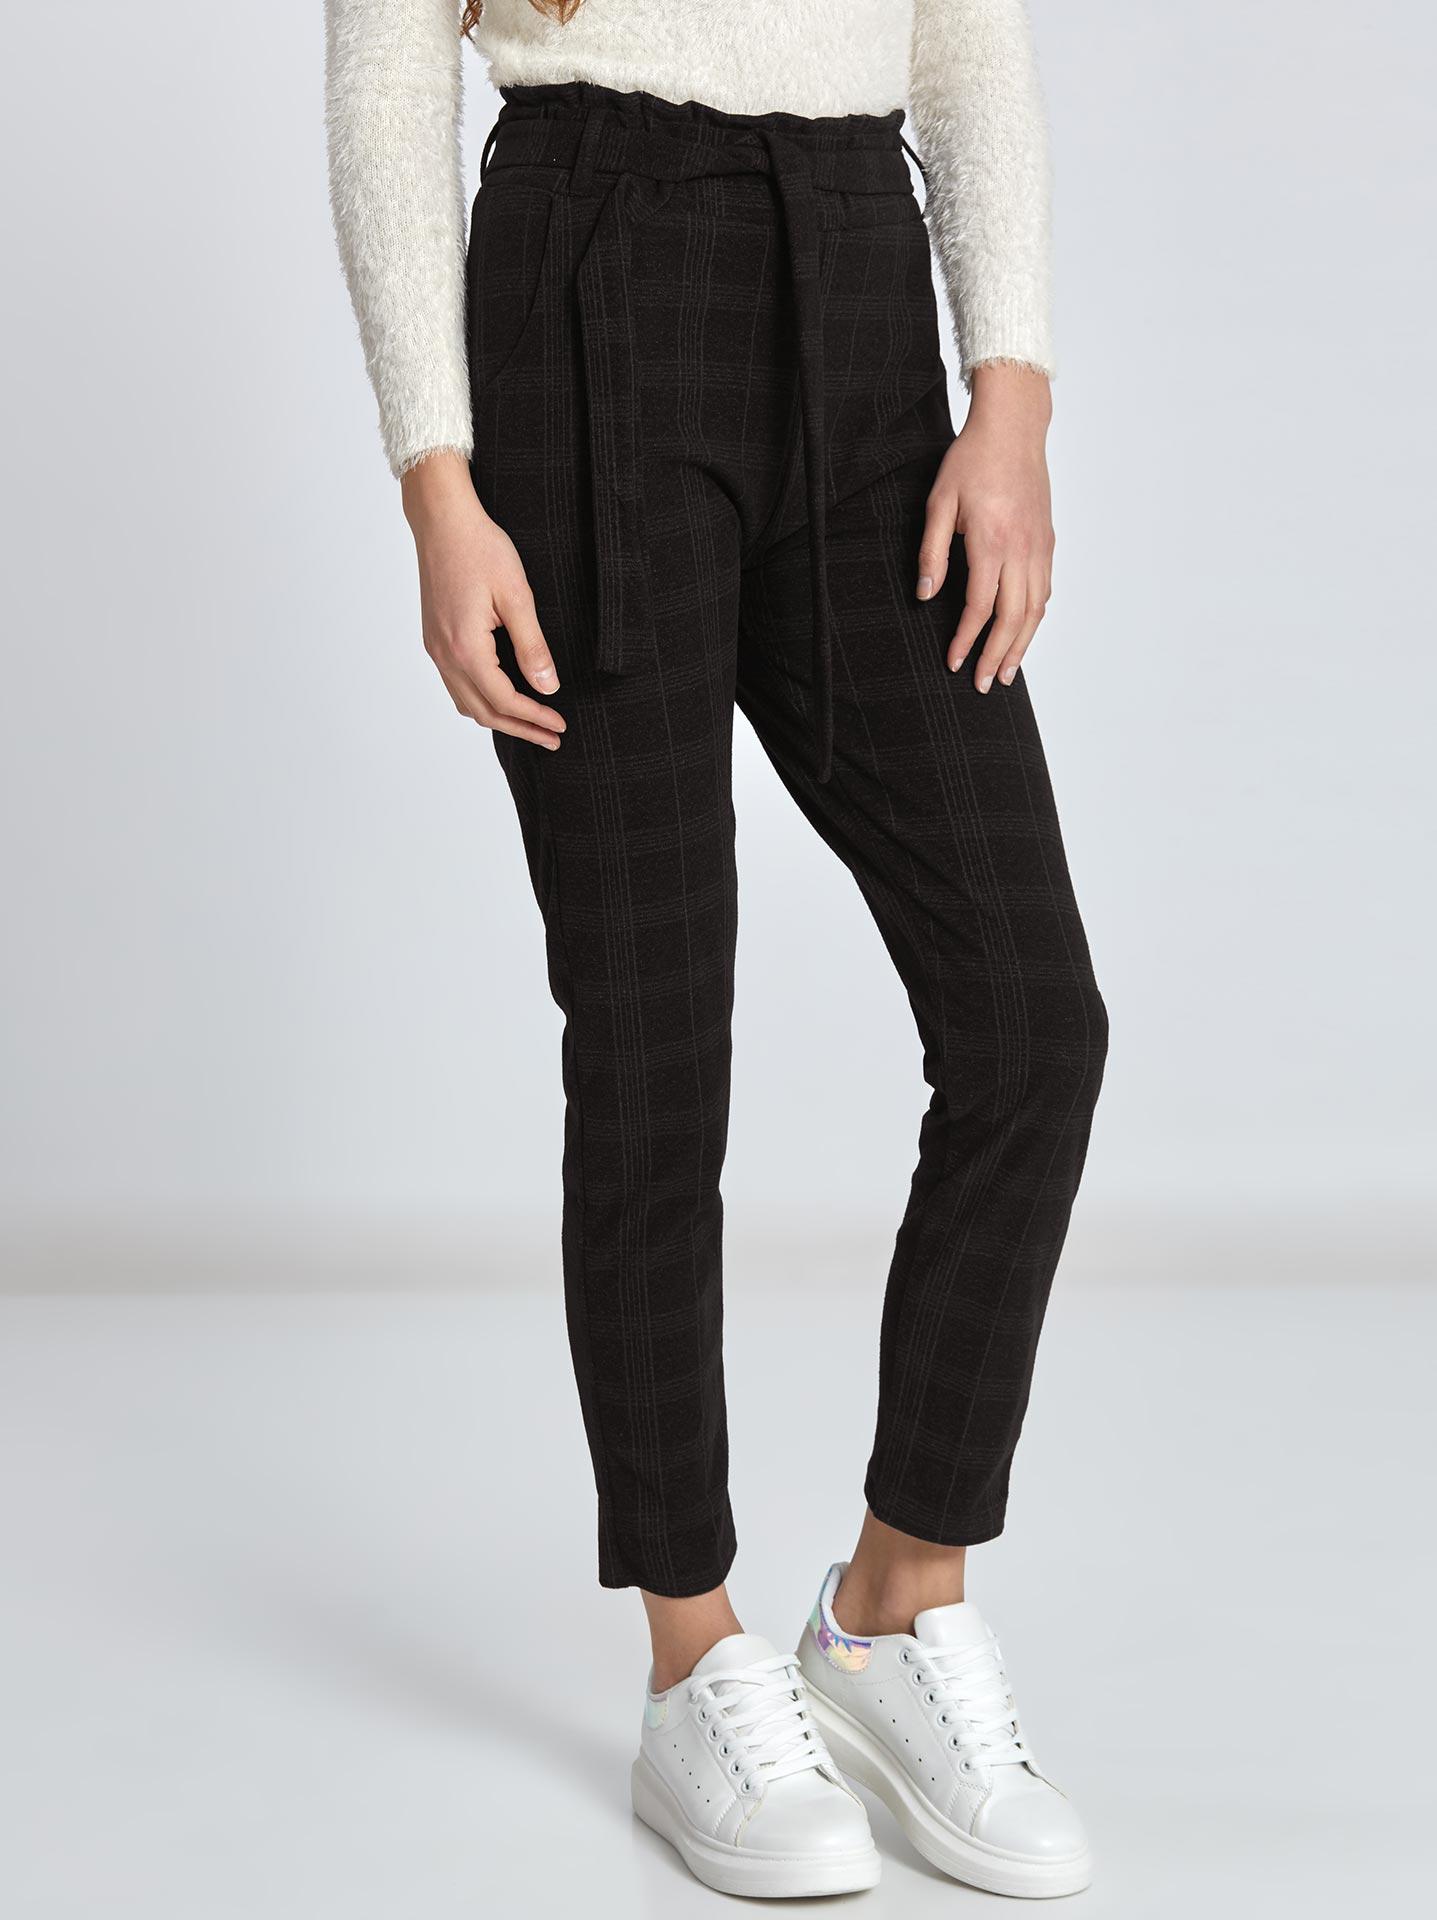 d139c04c5bac Καρό παντελόνι σε μαυρο